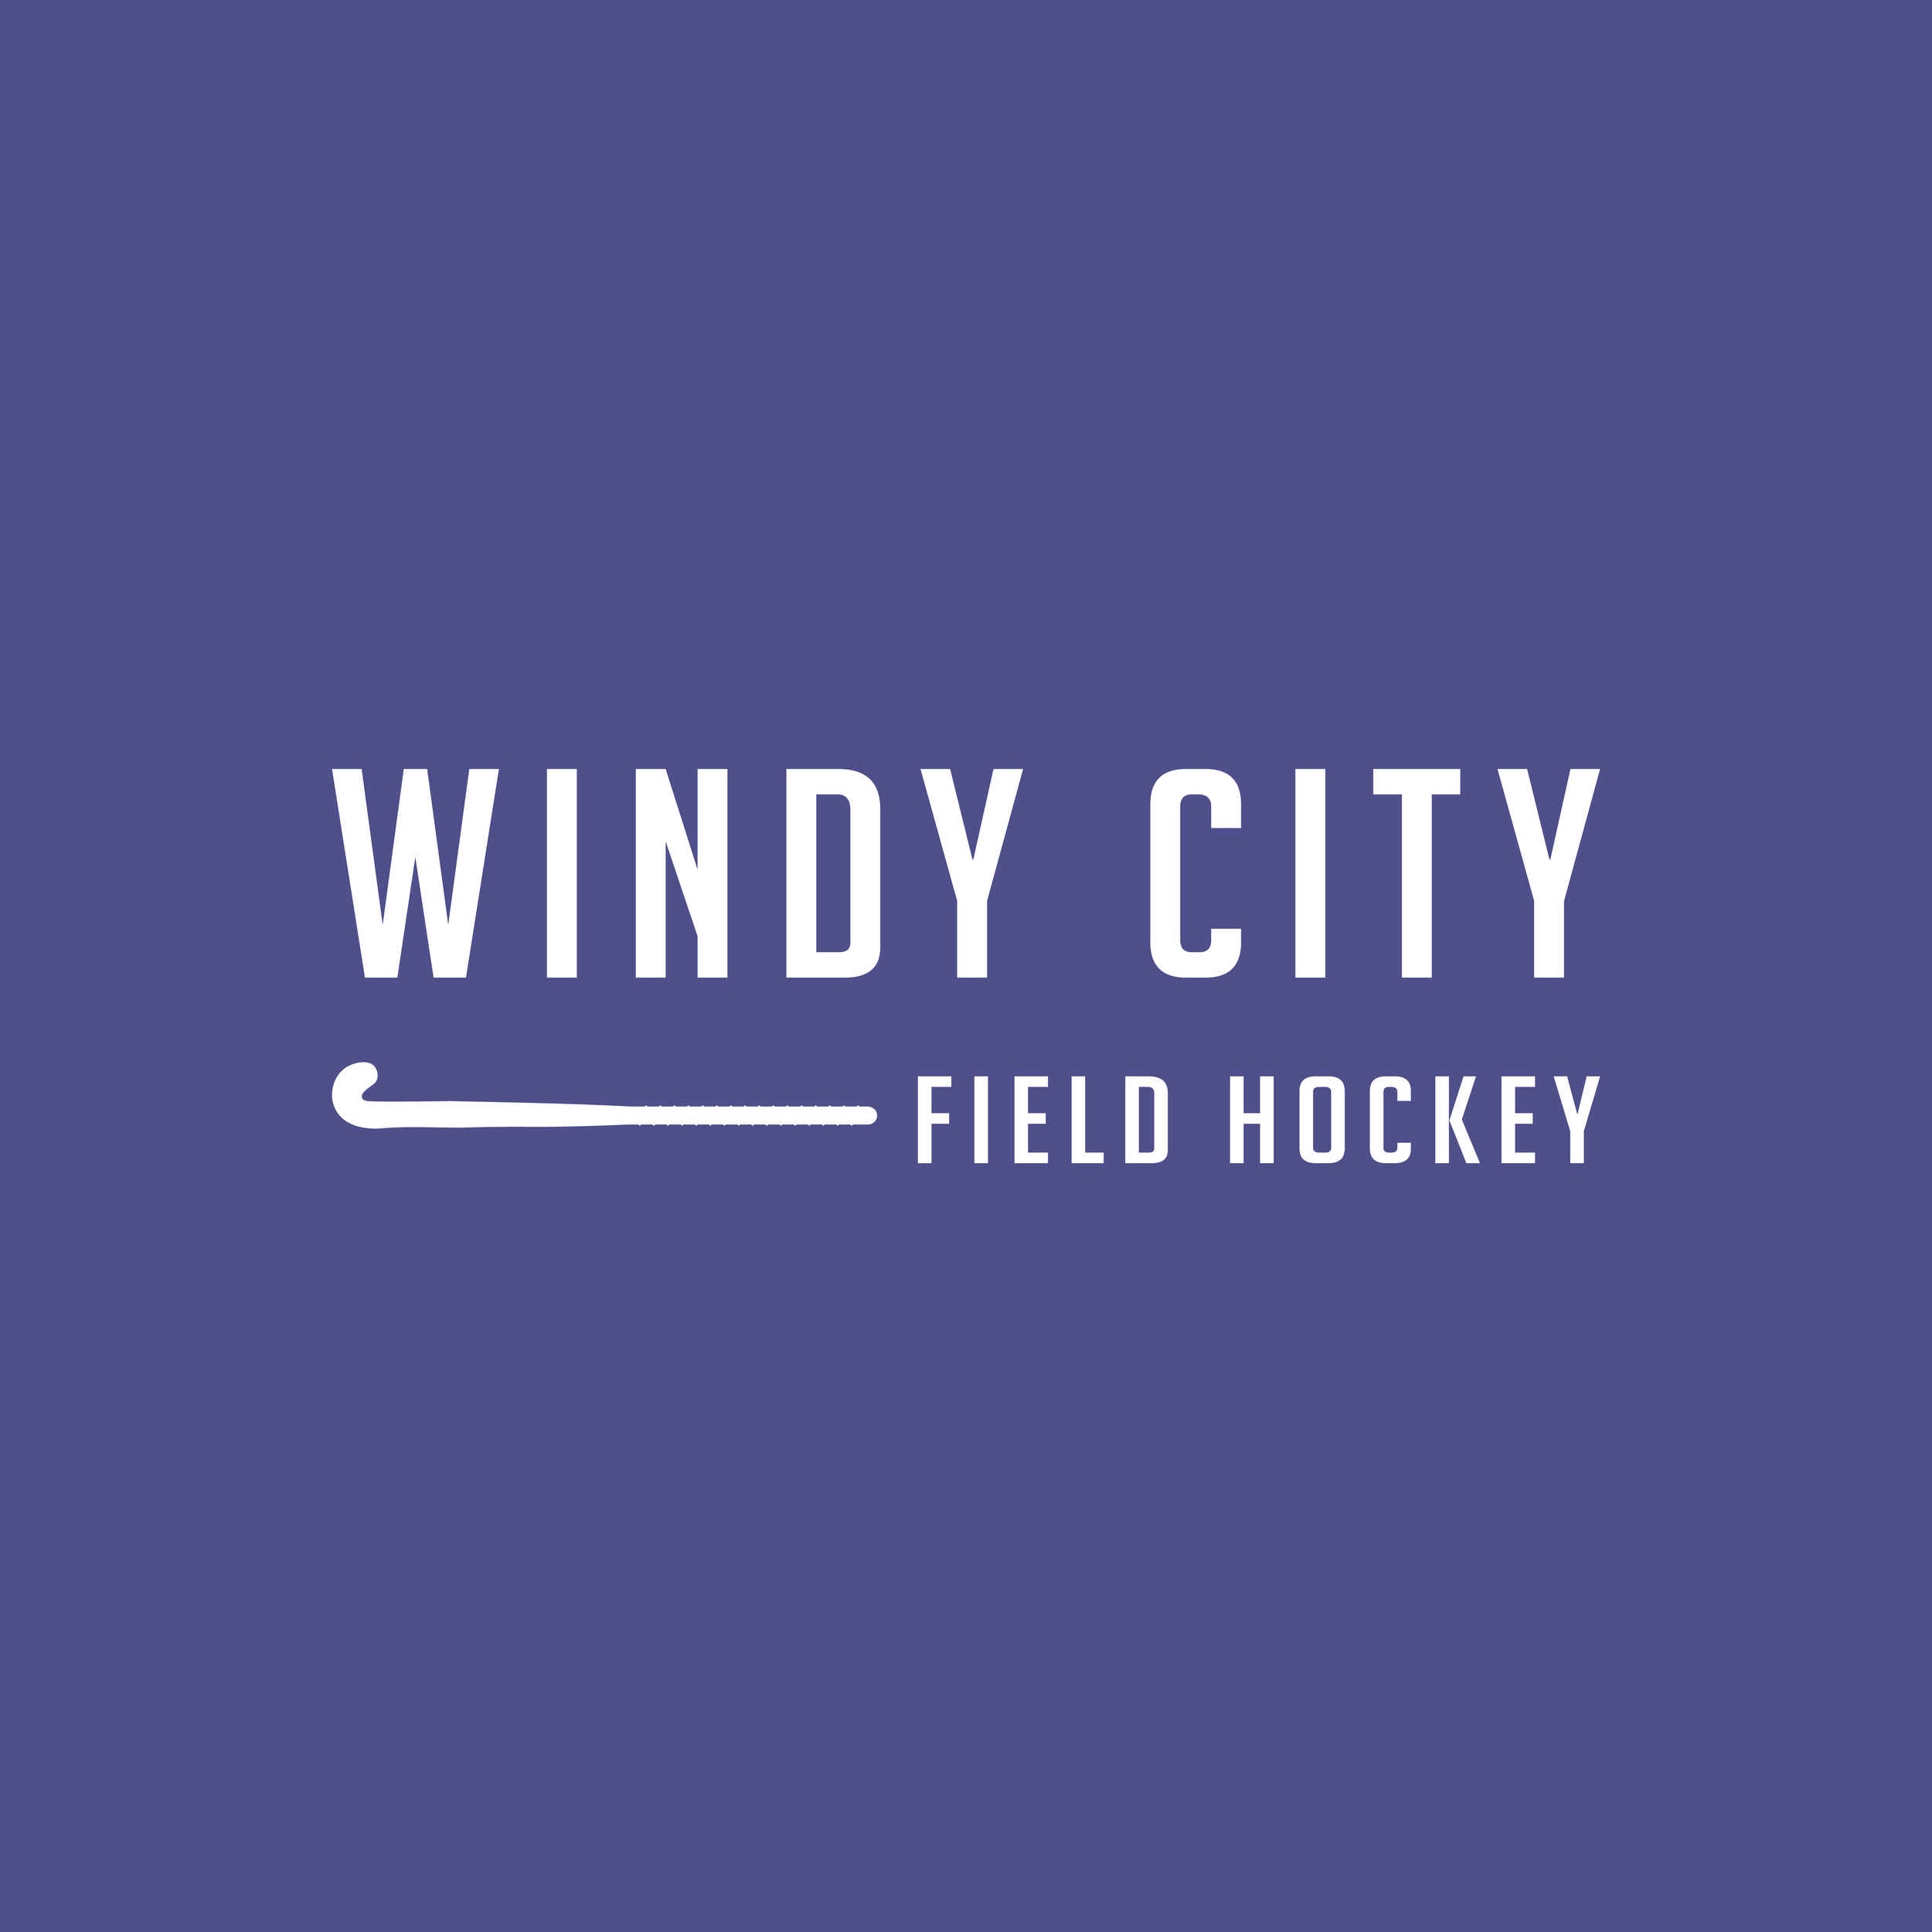 Windy City Field Hockey4.png